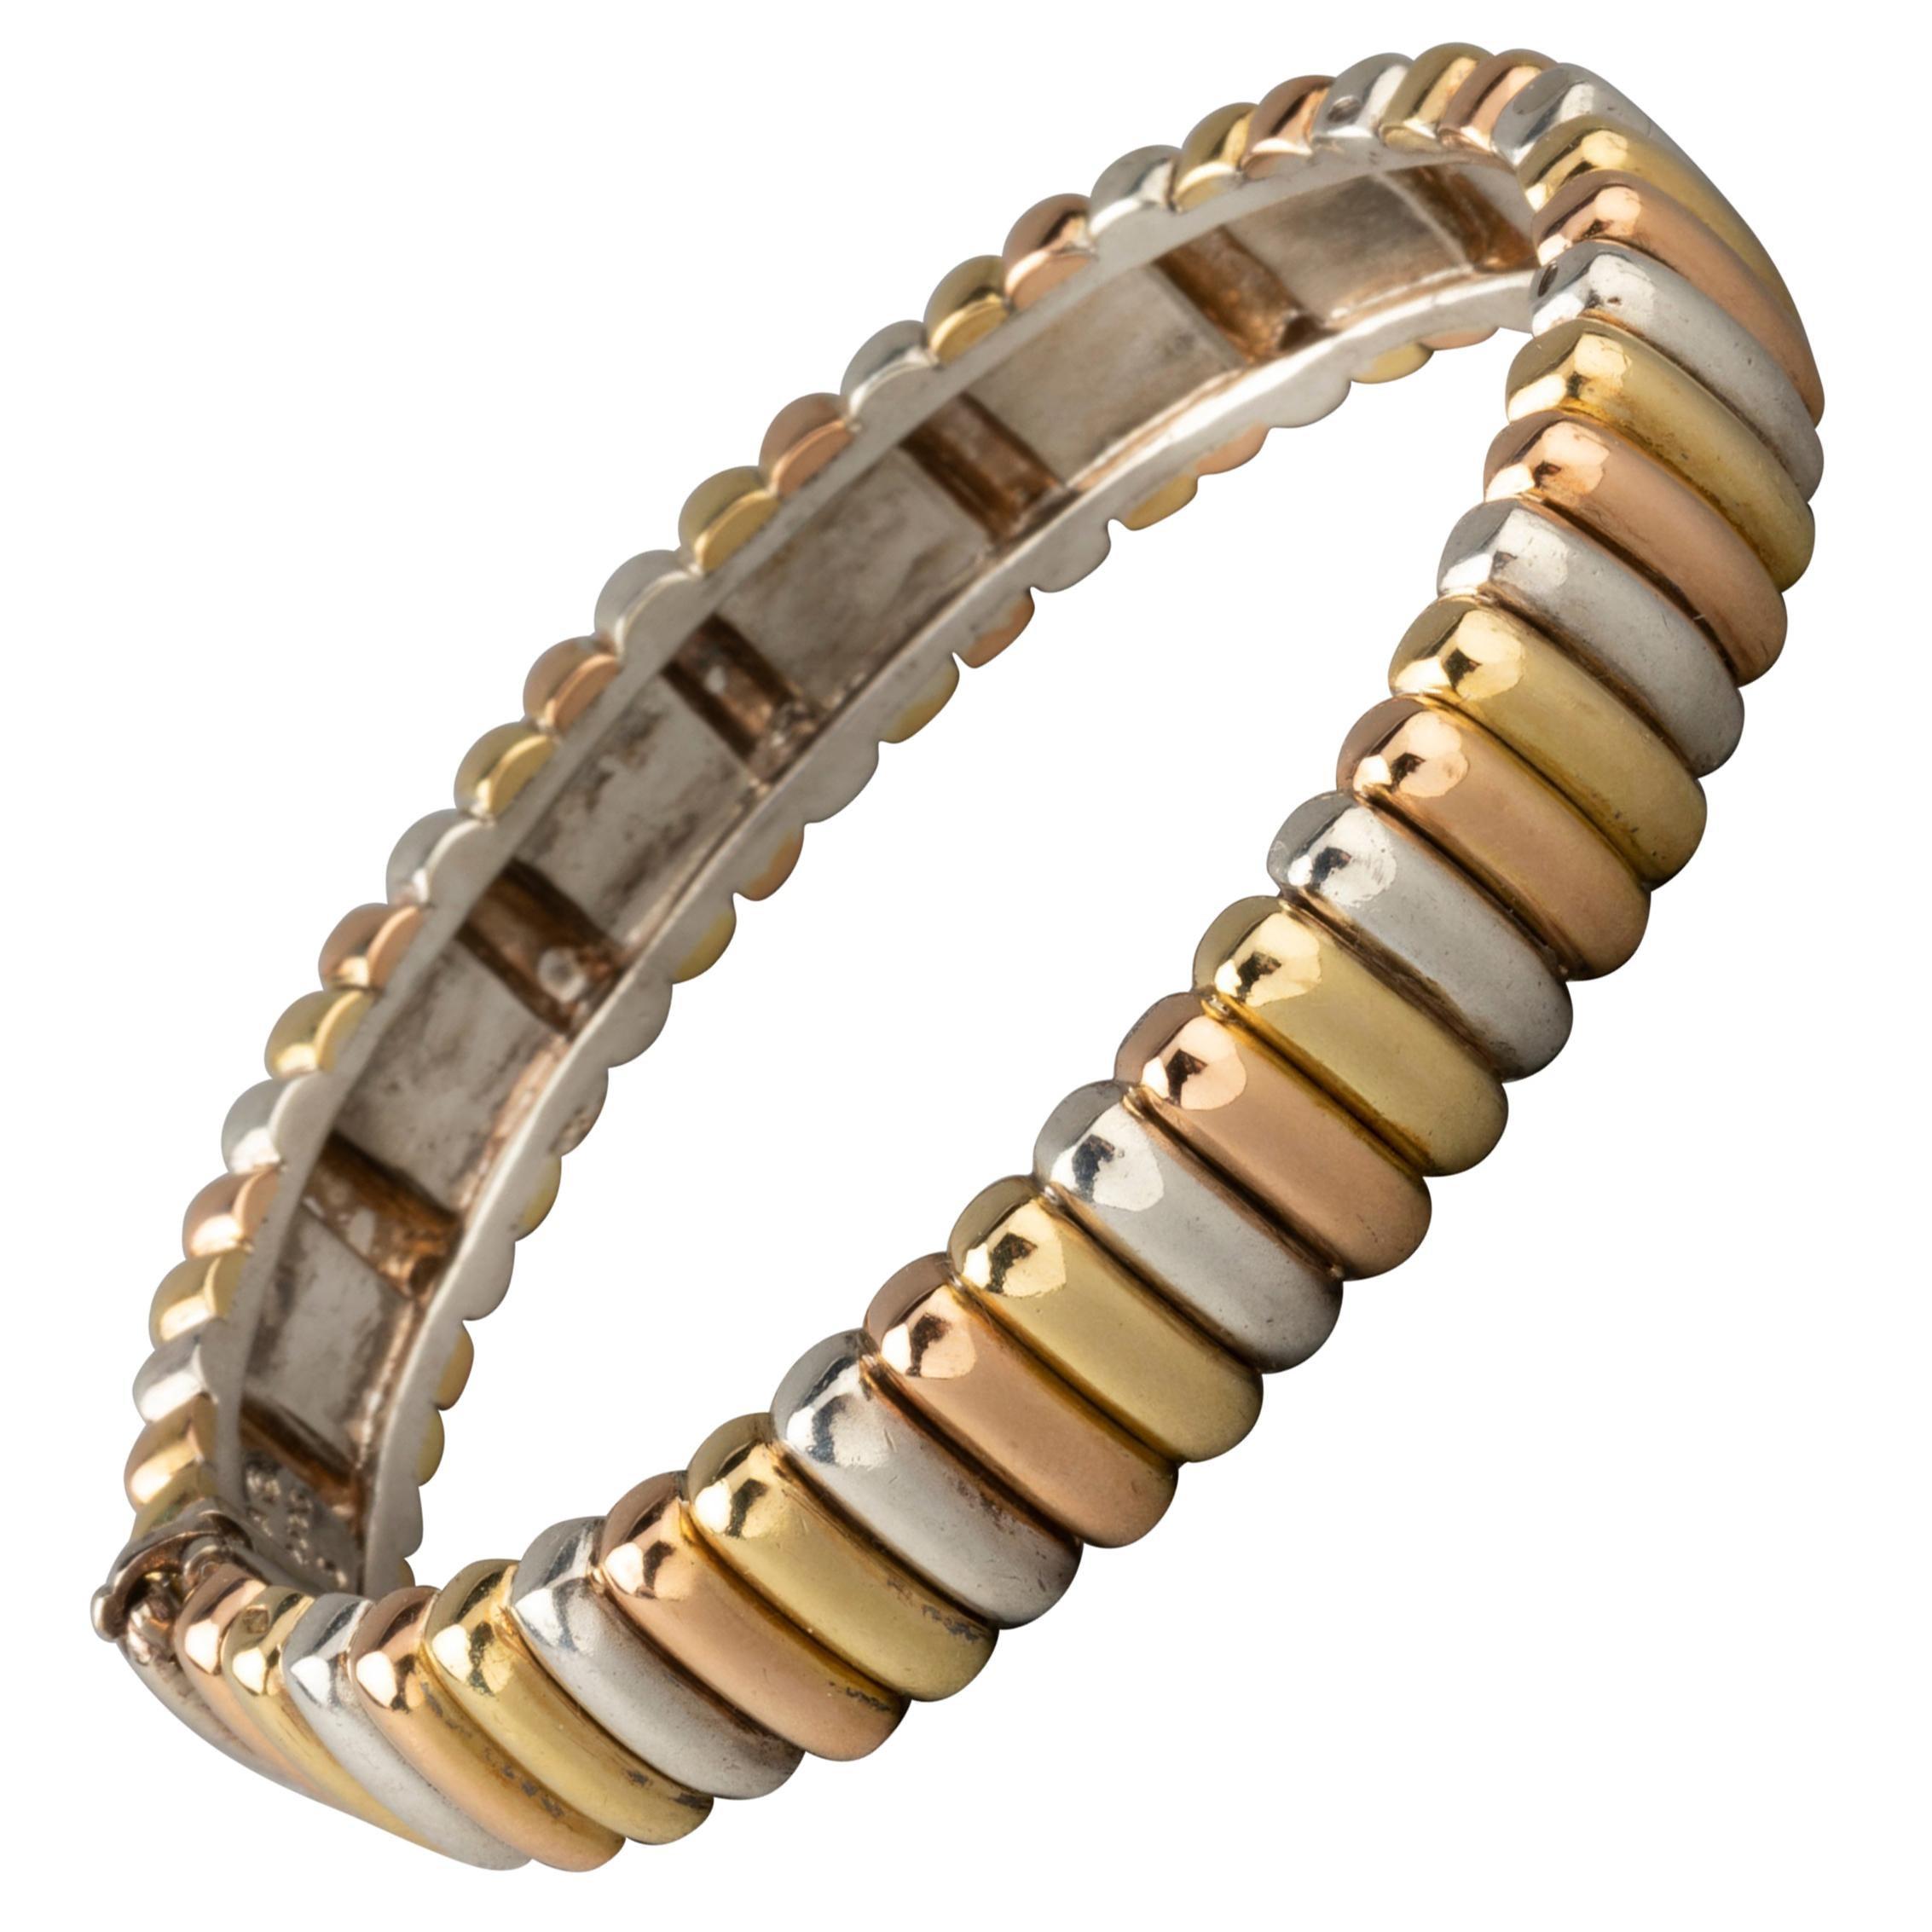 Van Cleef & Arpels Gold Bracelet Saint-Tropez Model